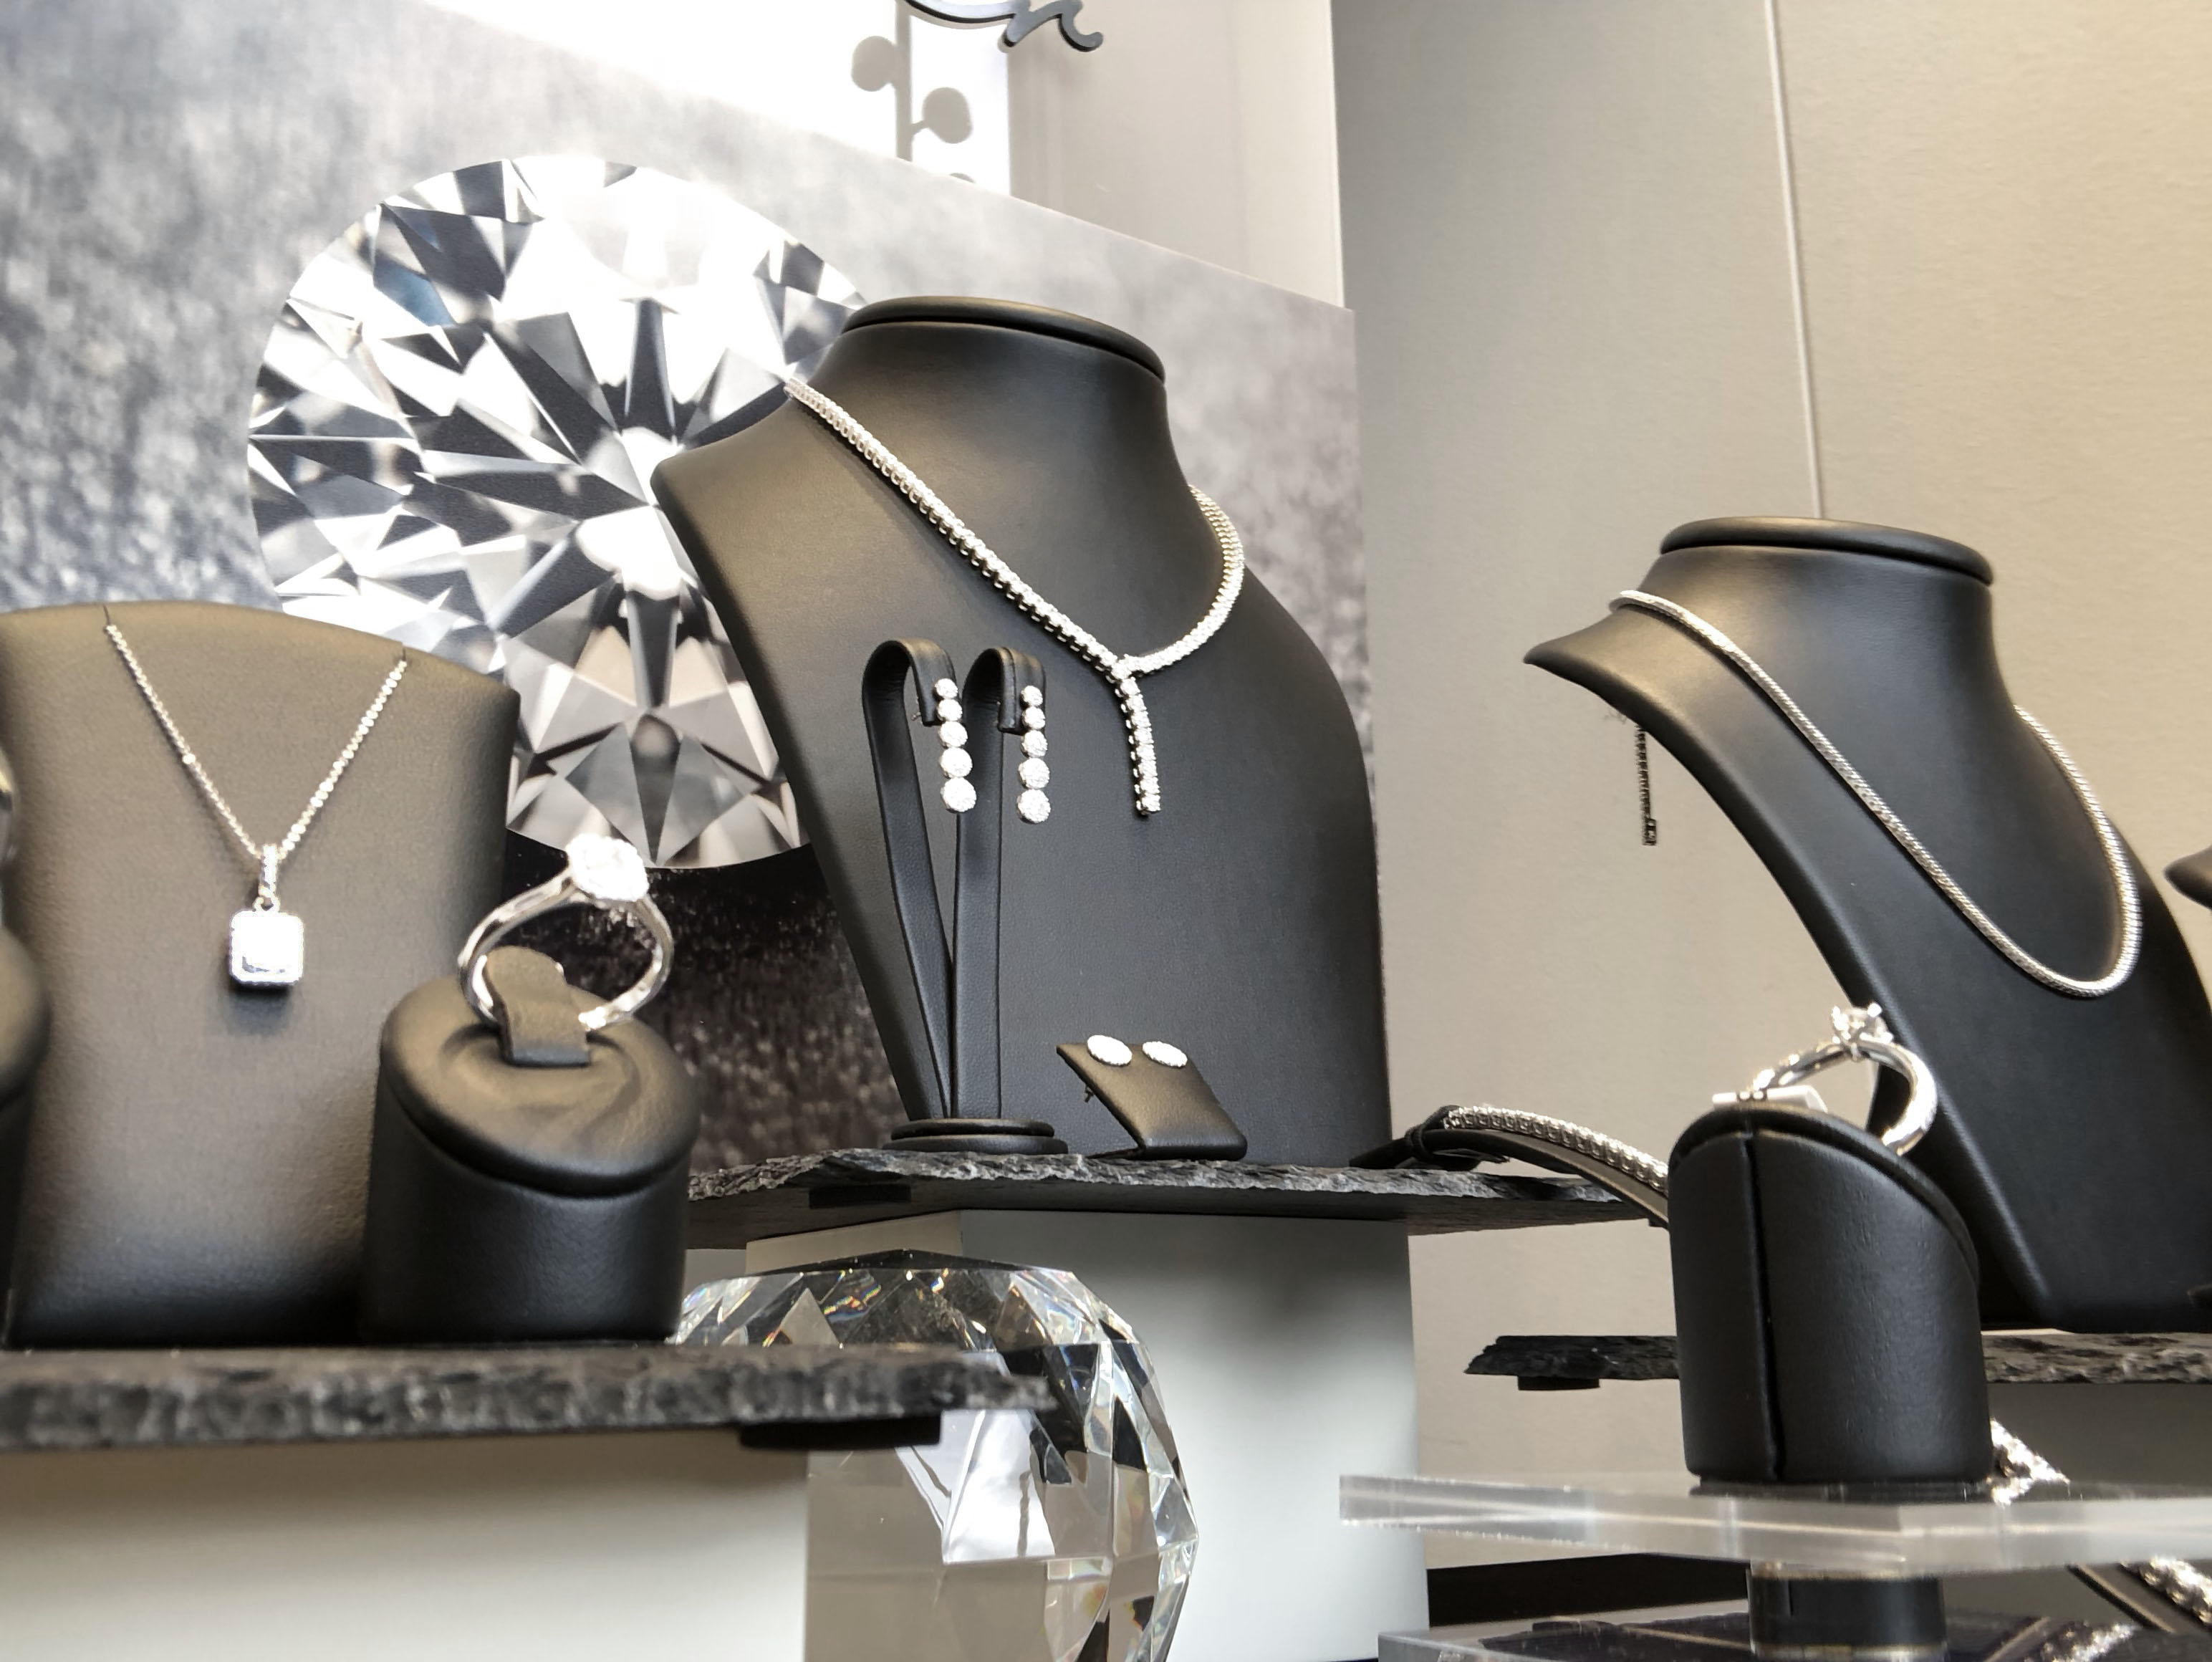 Juwelier Krebber Solitärringe Brillantketten Mönchengladbach